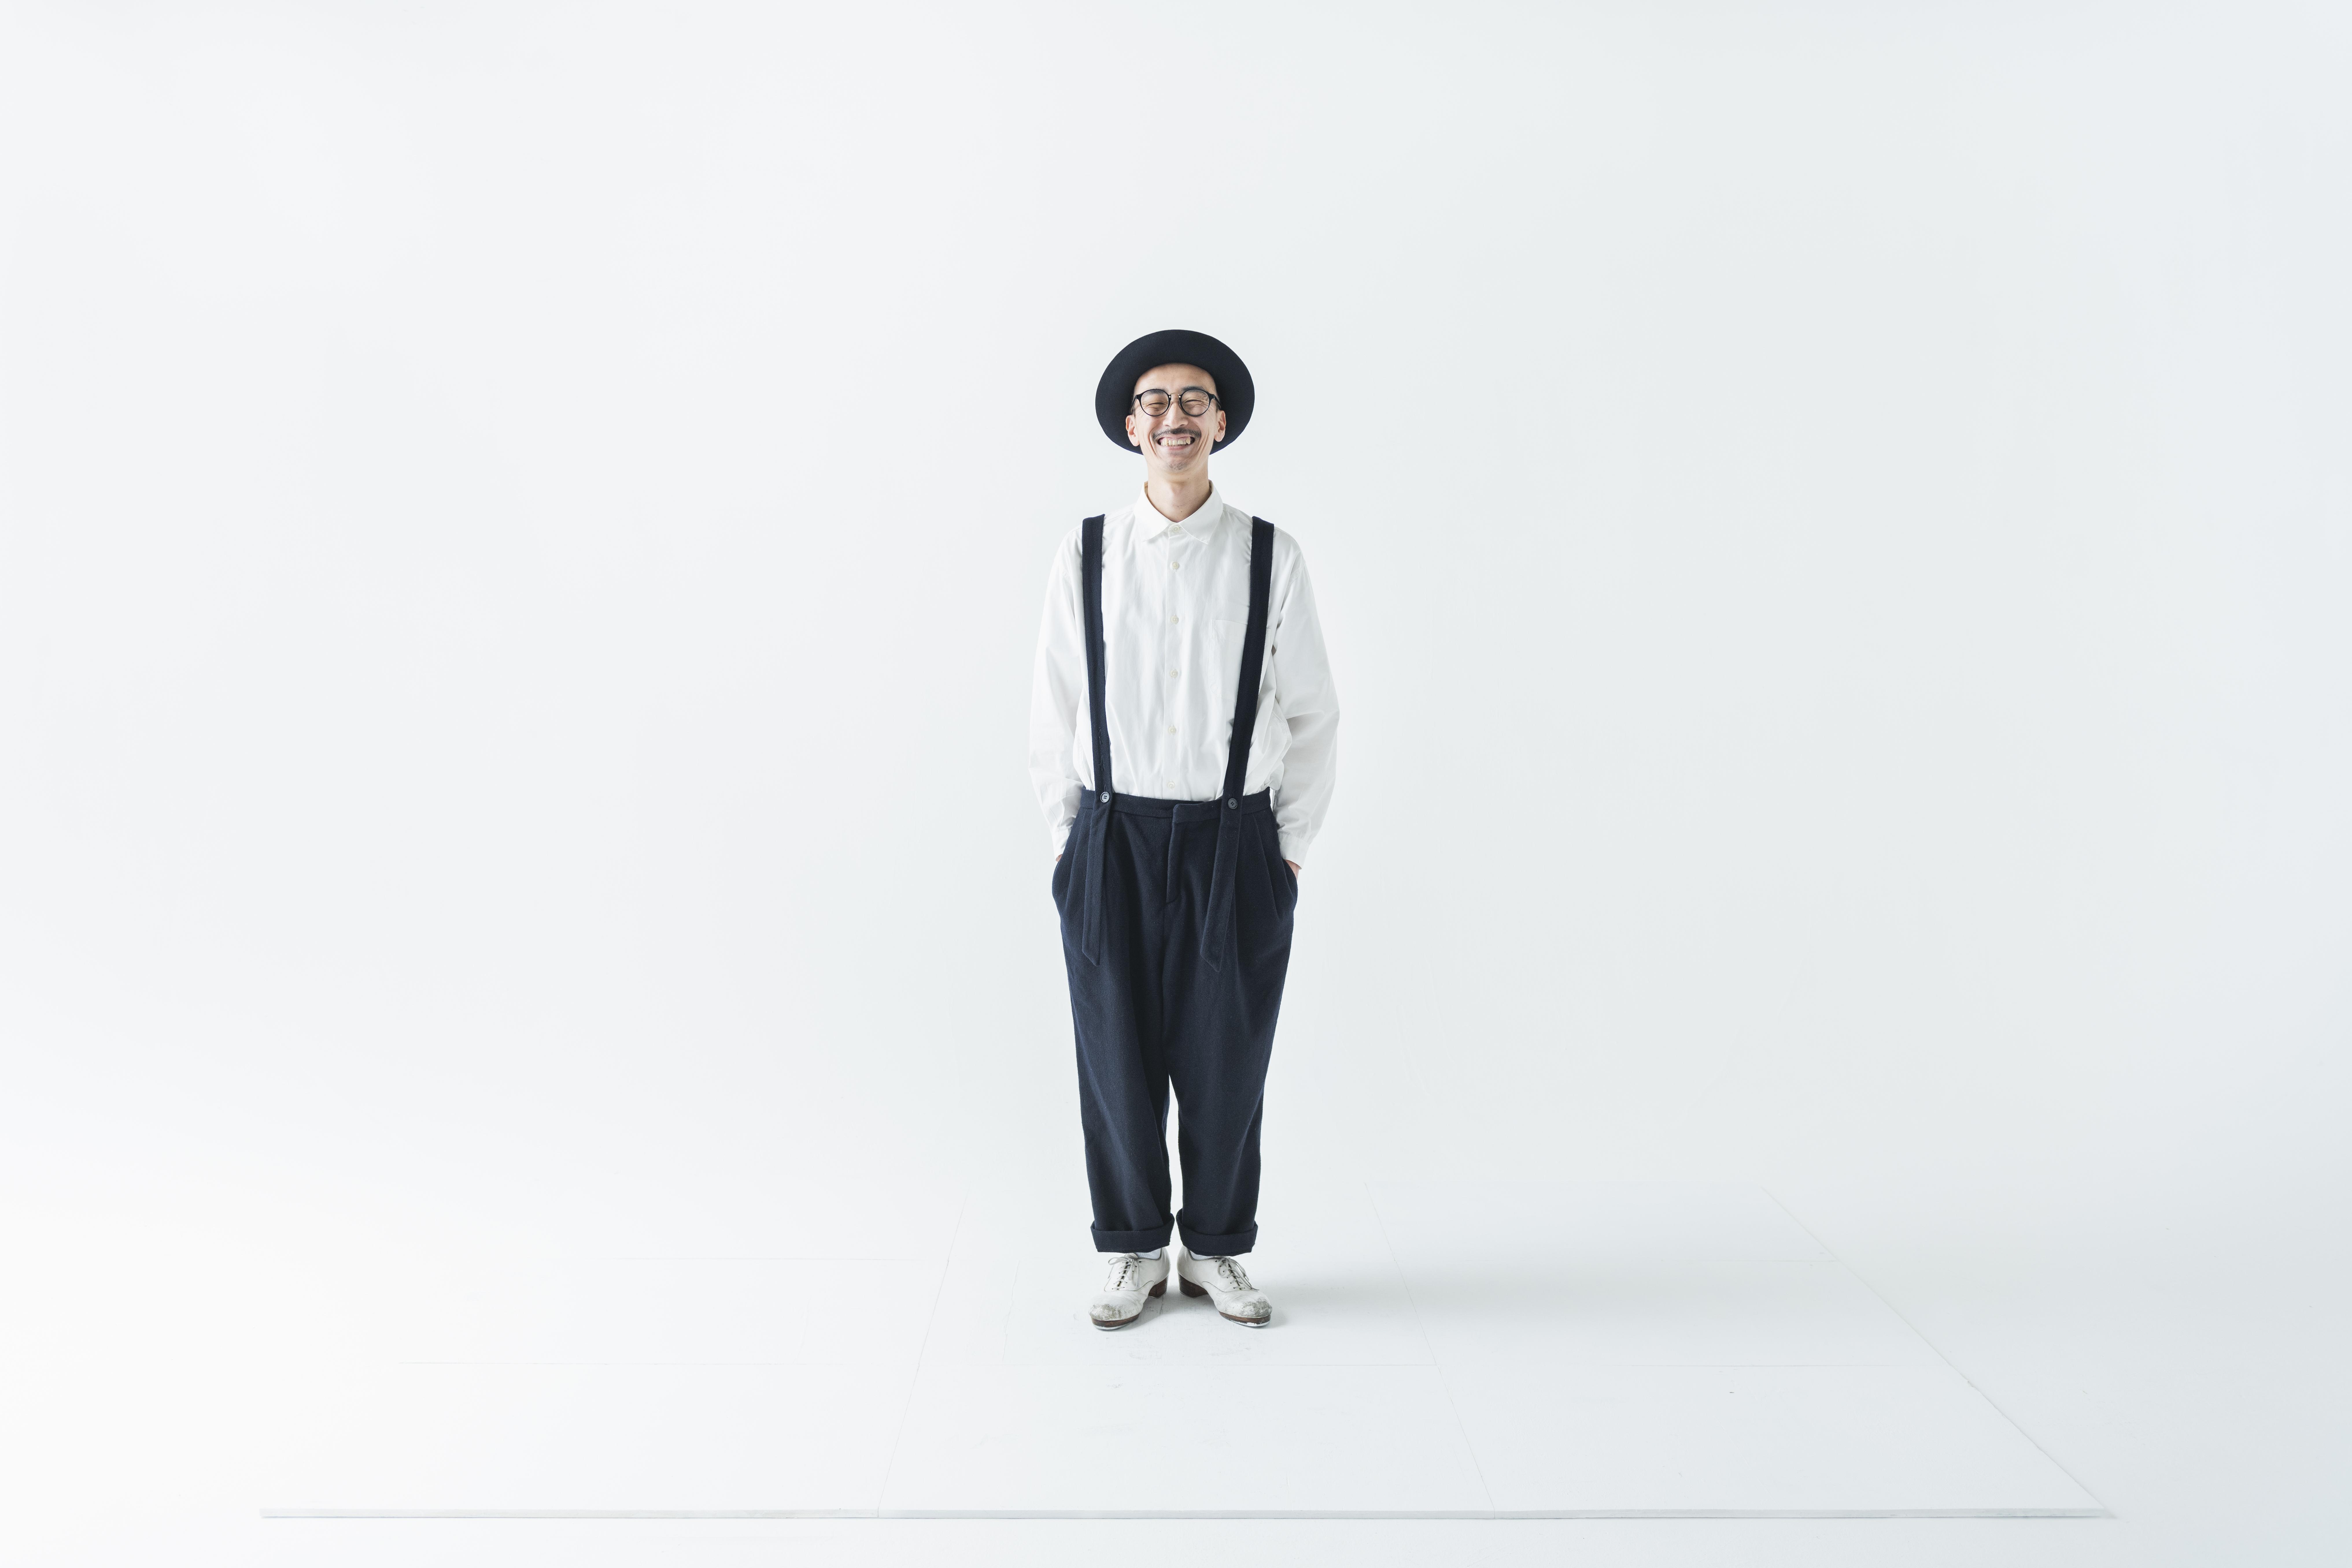 202029_murata_masaki_0991